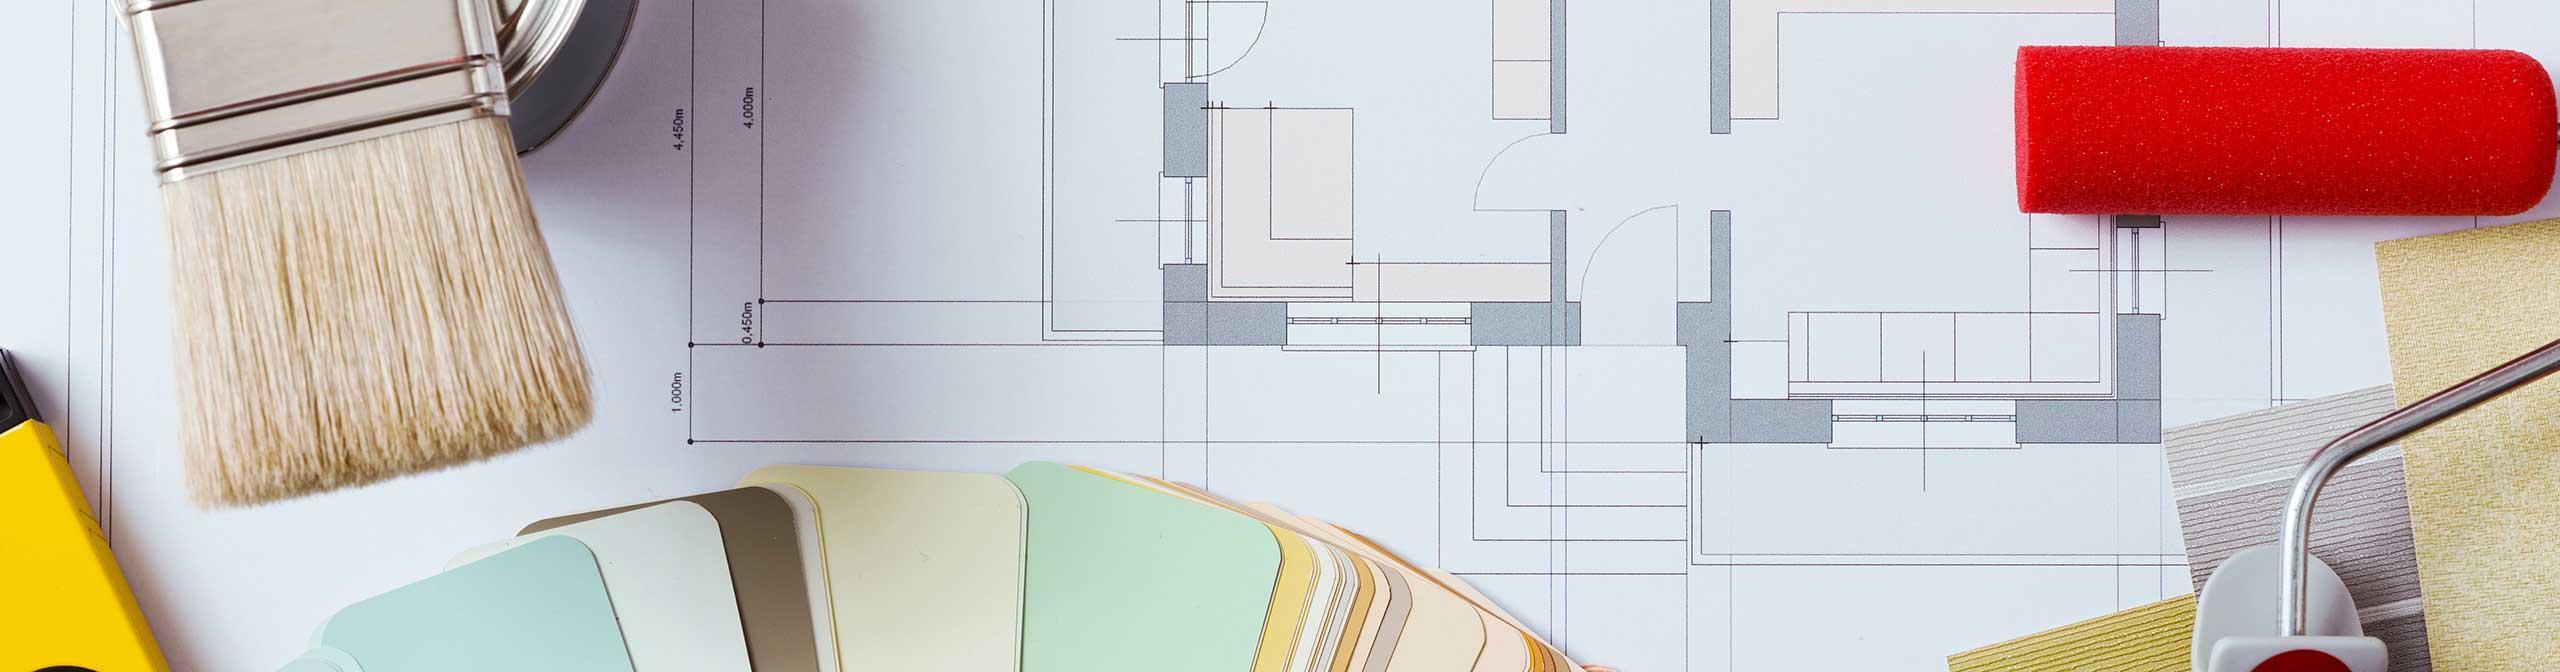 home-design-rules-optimize.jpg